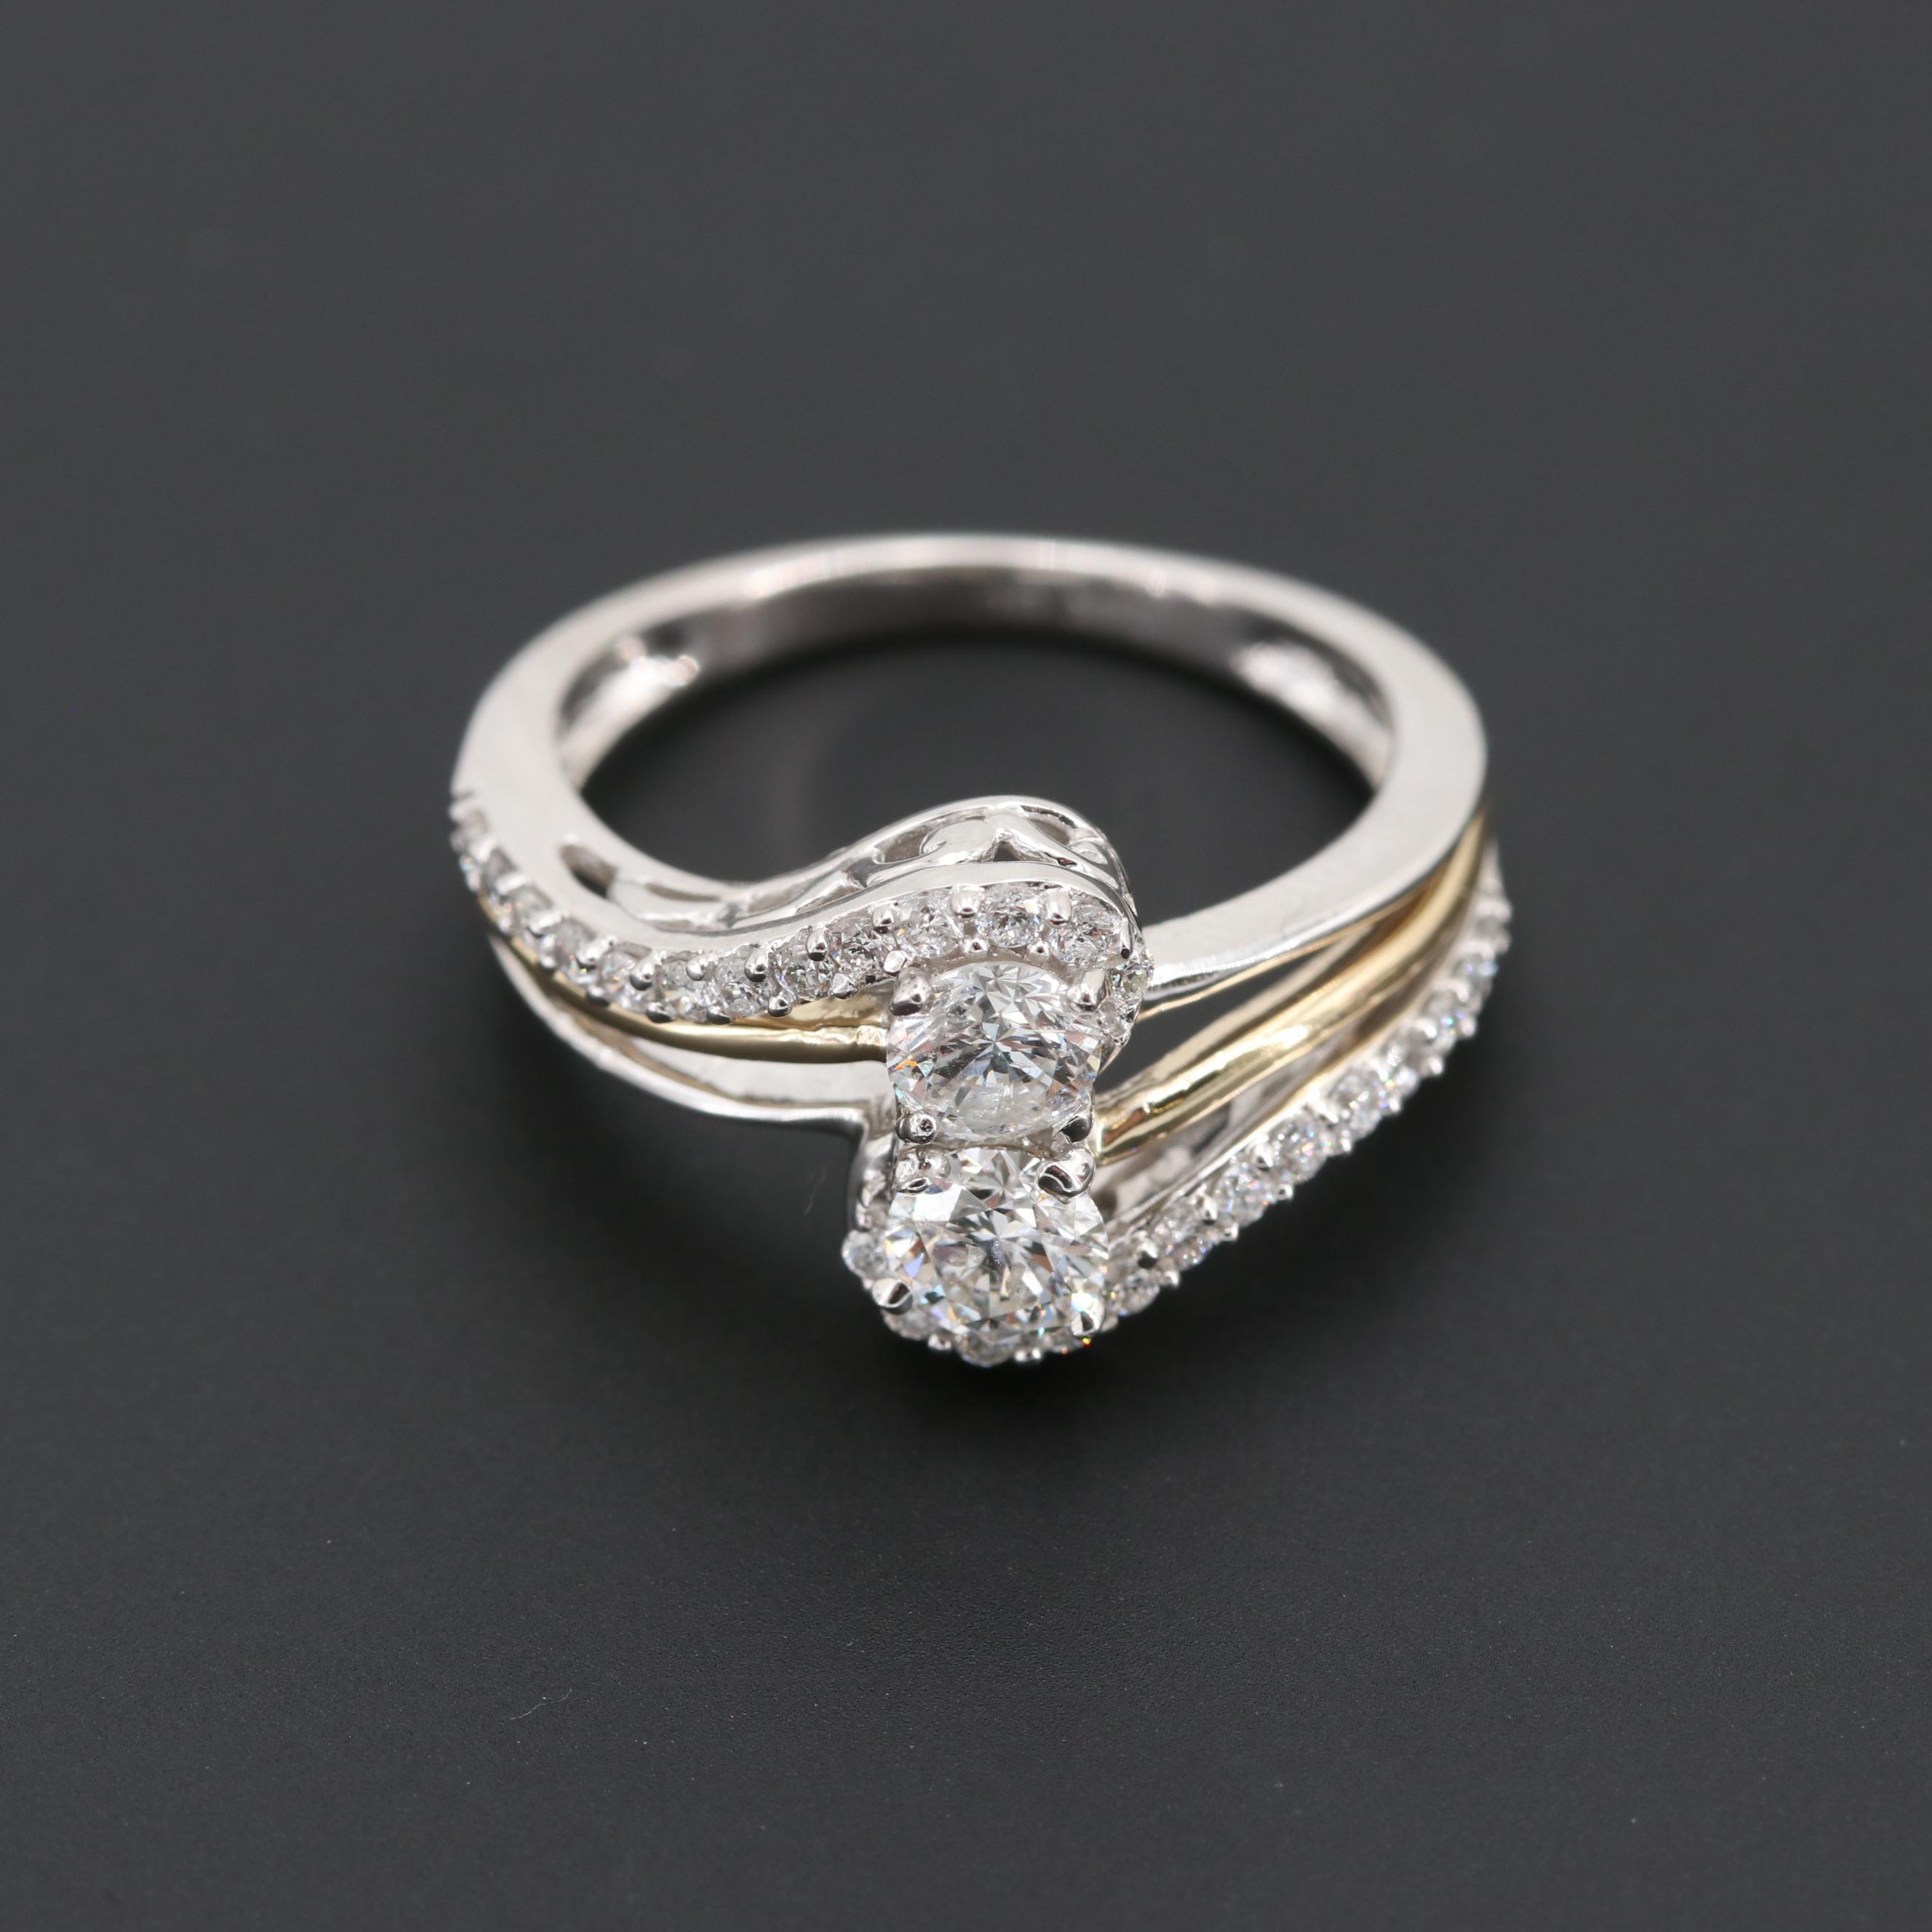 14K White Gold 1.01 CTW Diamond Ring